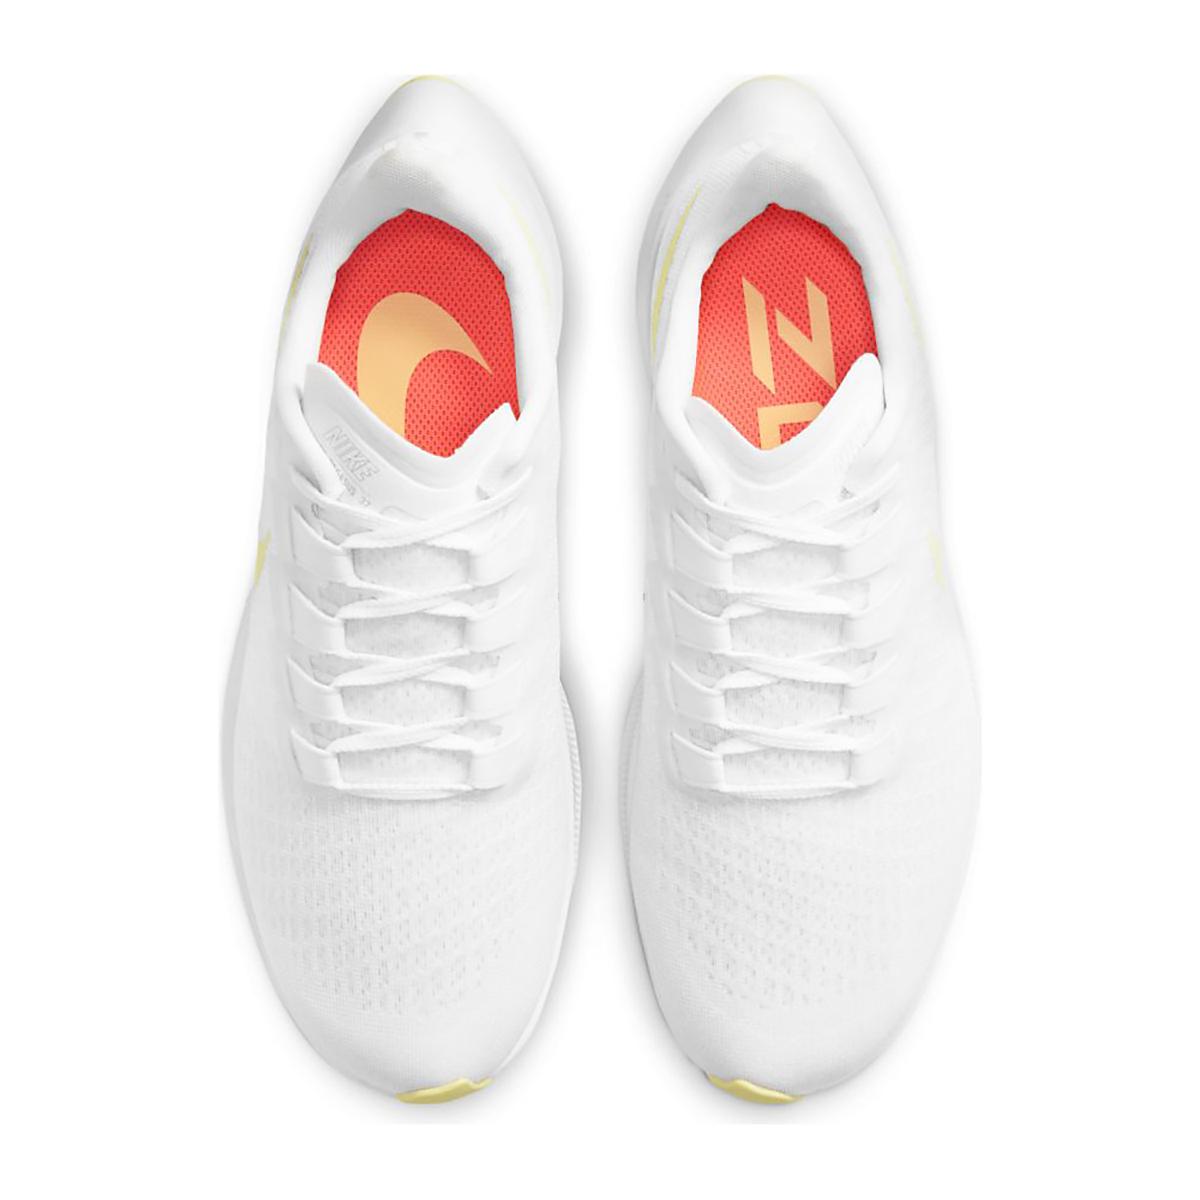 Women's Nike Air Zoom Pegasus 37 Running Shoe - Color: White/Lite Zitron/Bright Mango - Size: 5 - Width: Regular, White/Lite Zitron/Bright Mango, large, image 6